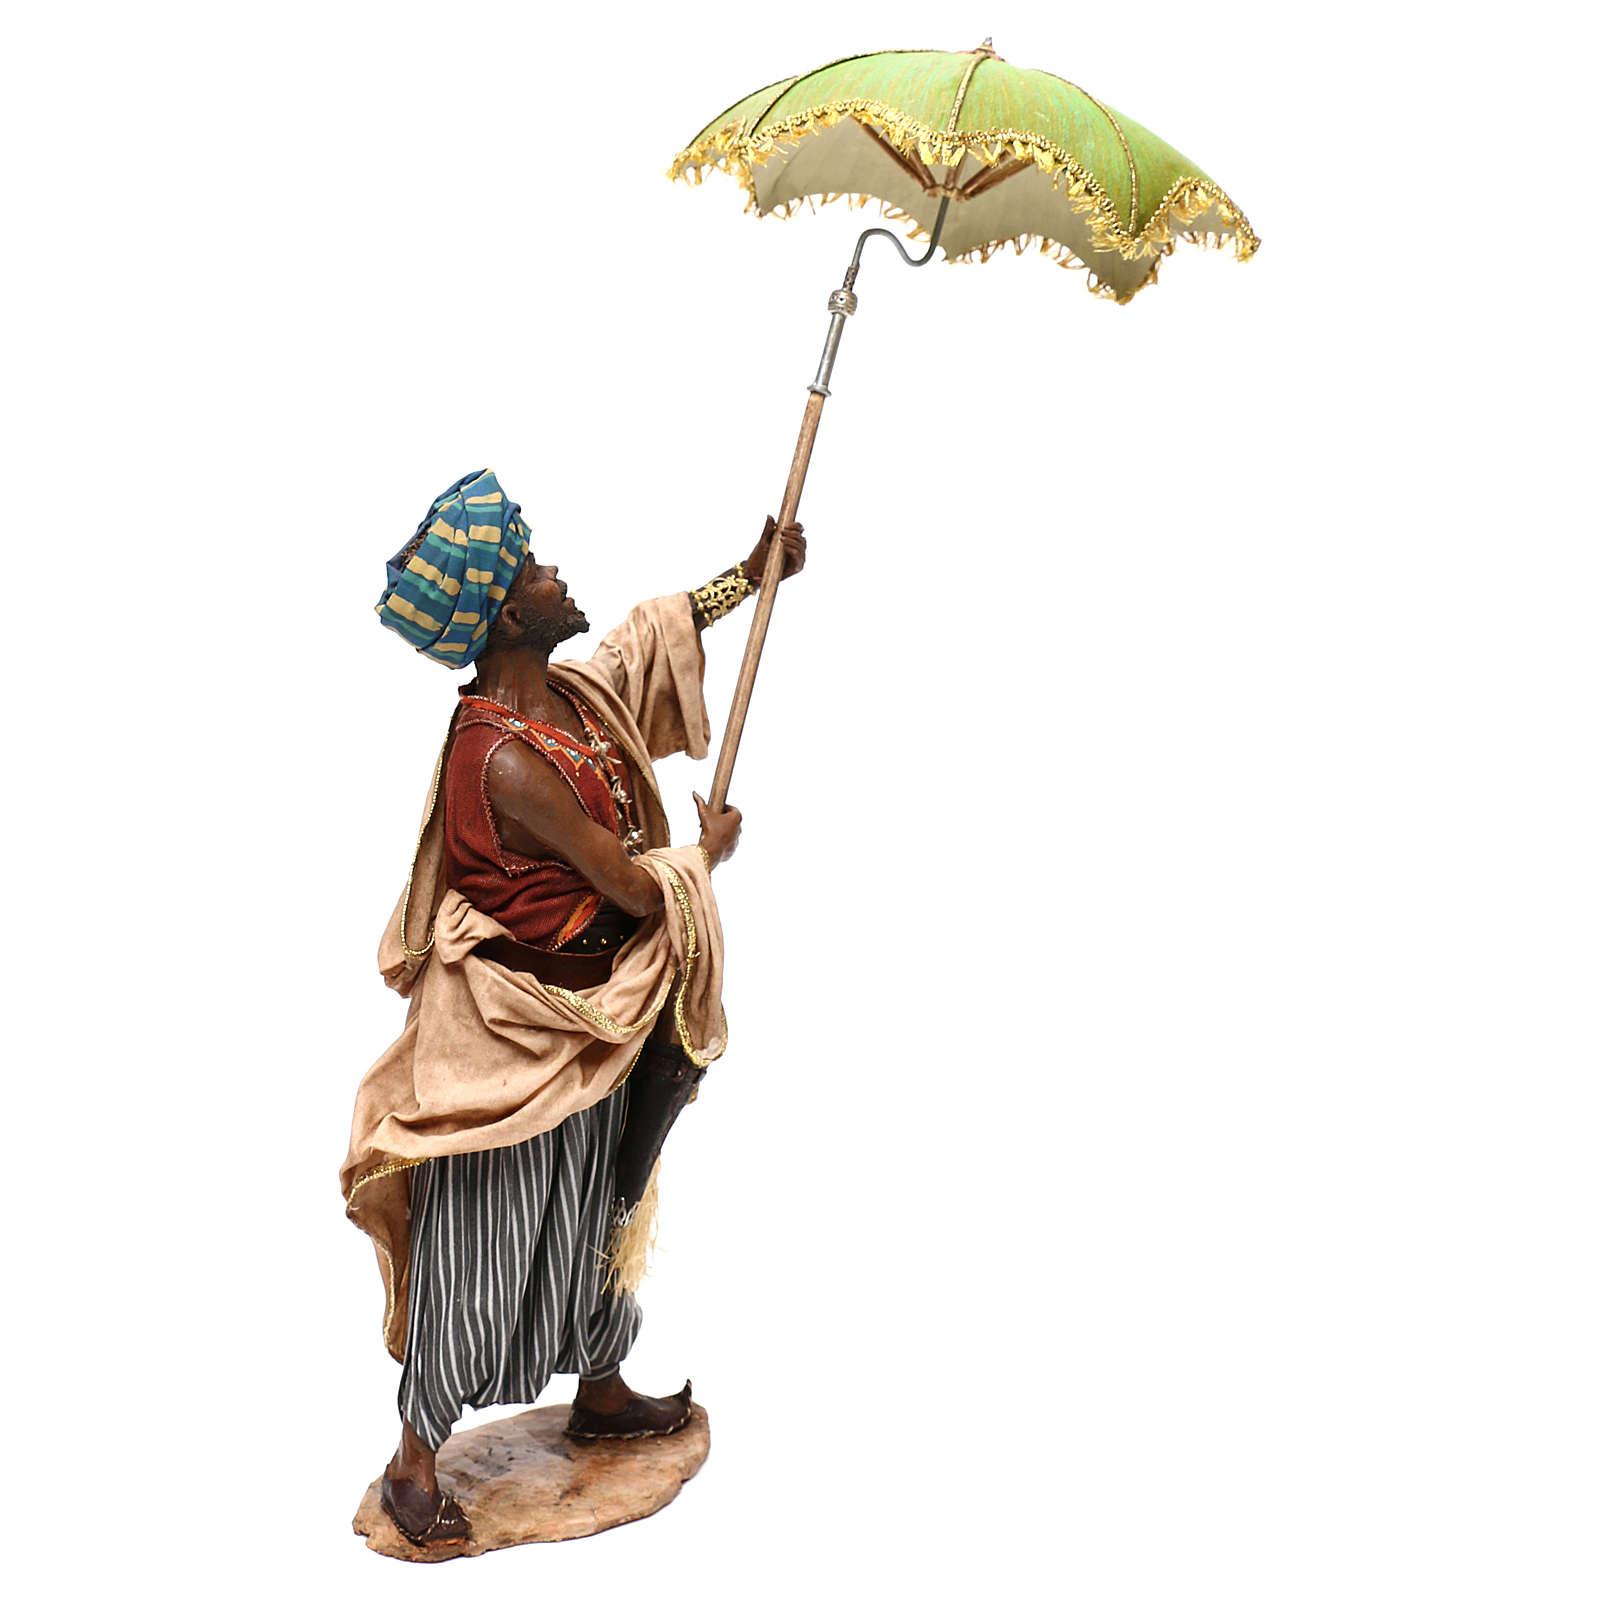 Nativity scene servant with umbrella, 30 cm by Angela Tripi 4